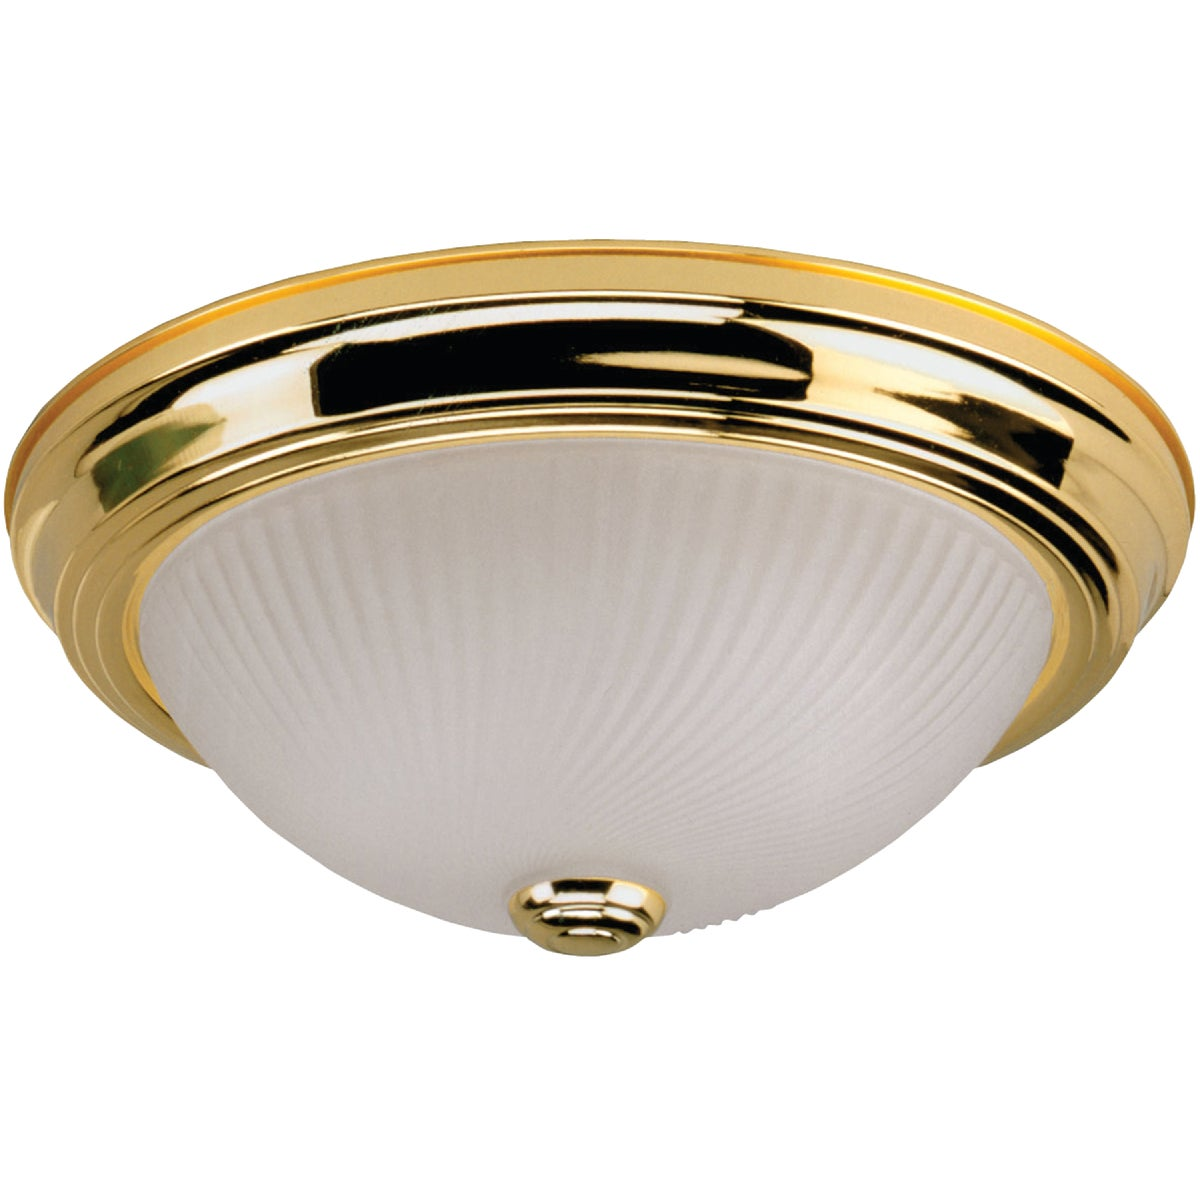 Westinghouse Lighting 1BULB PB CEILING FIXTURE 66327